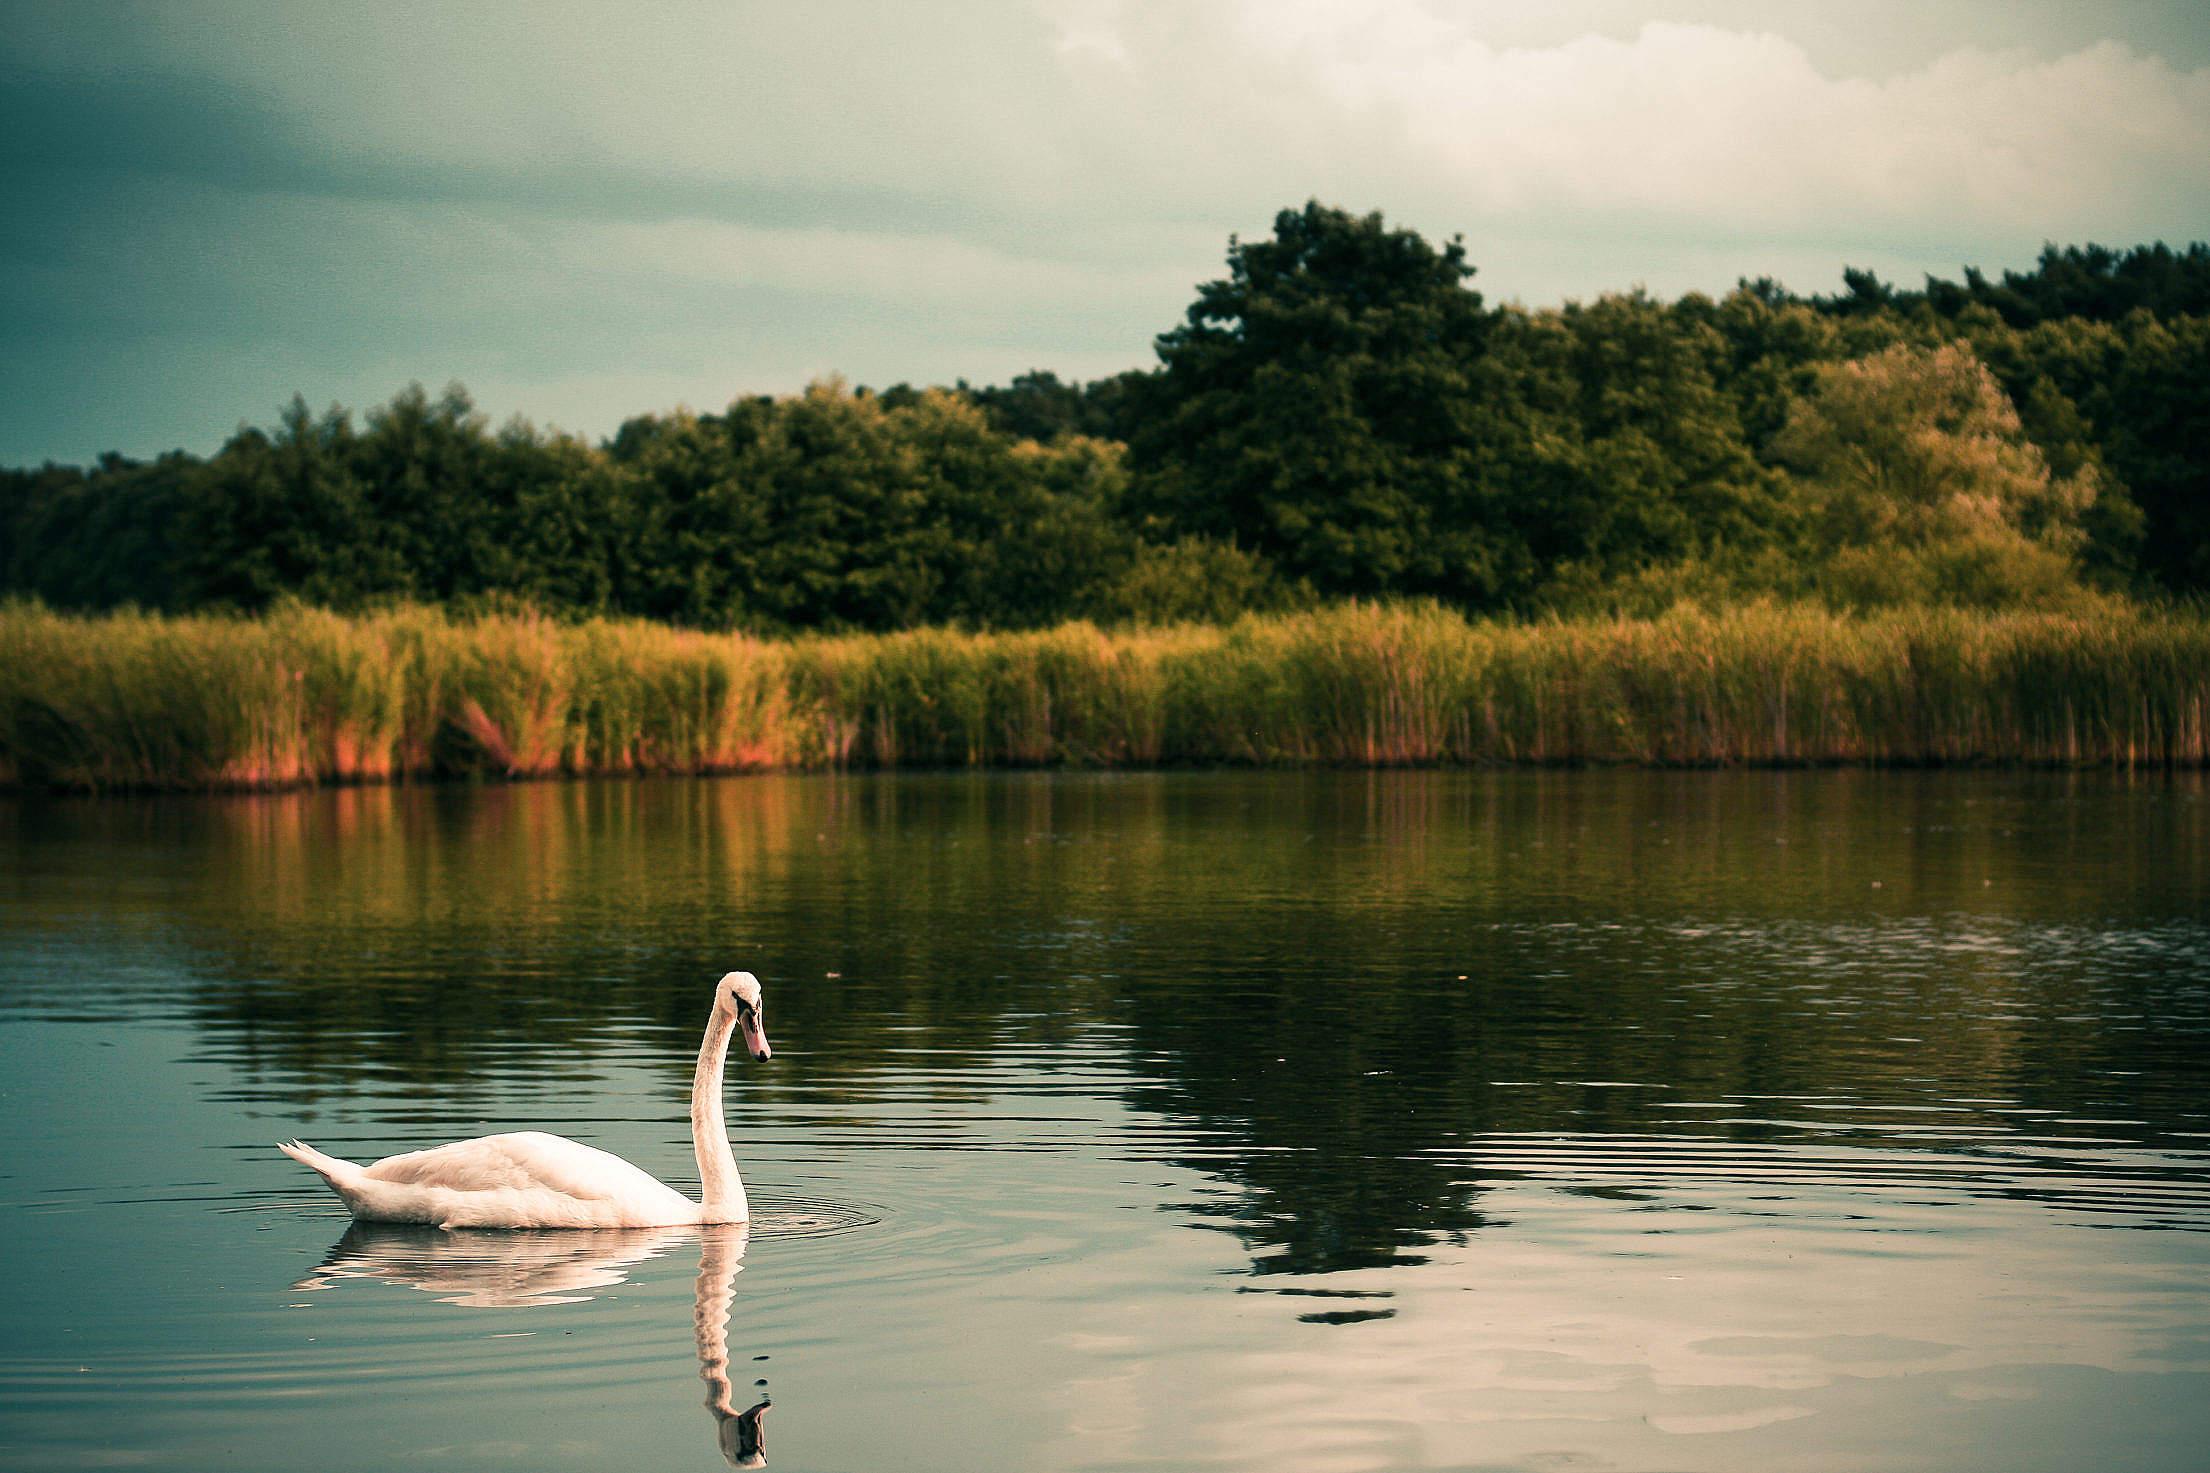 Swan on the Lake Free Stock Photo